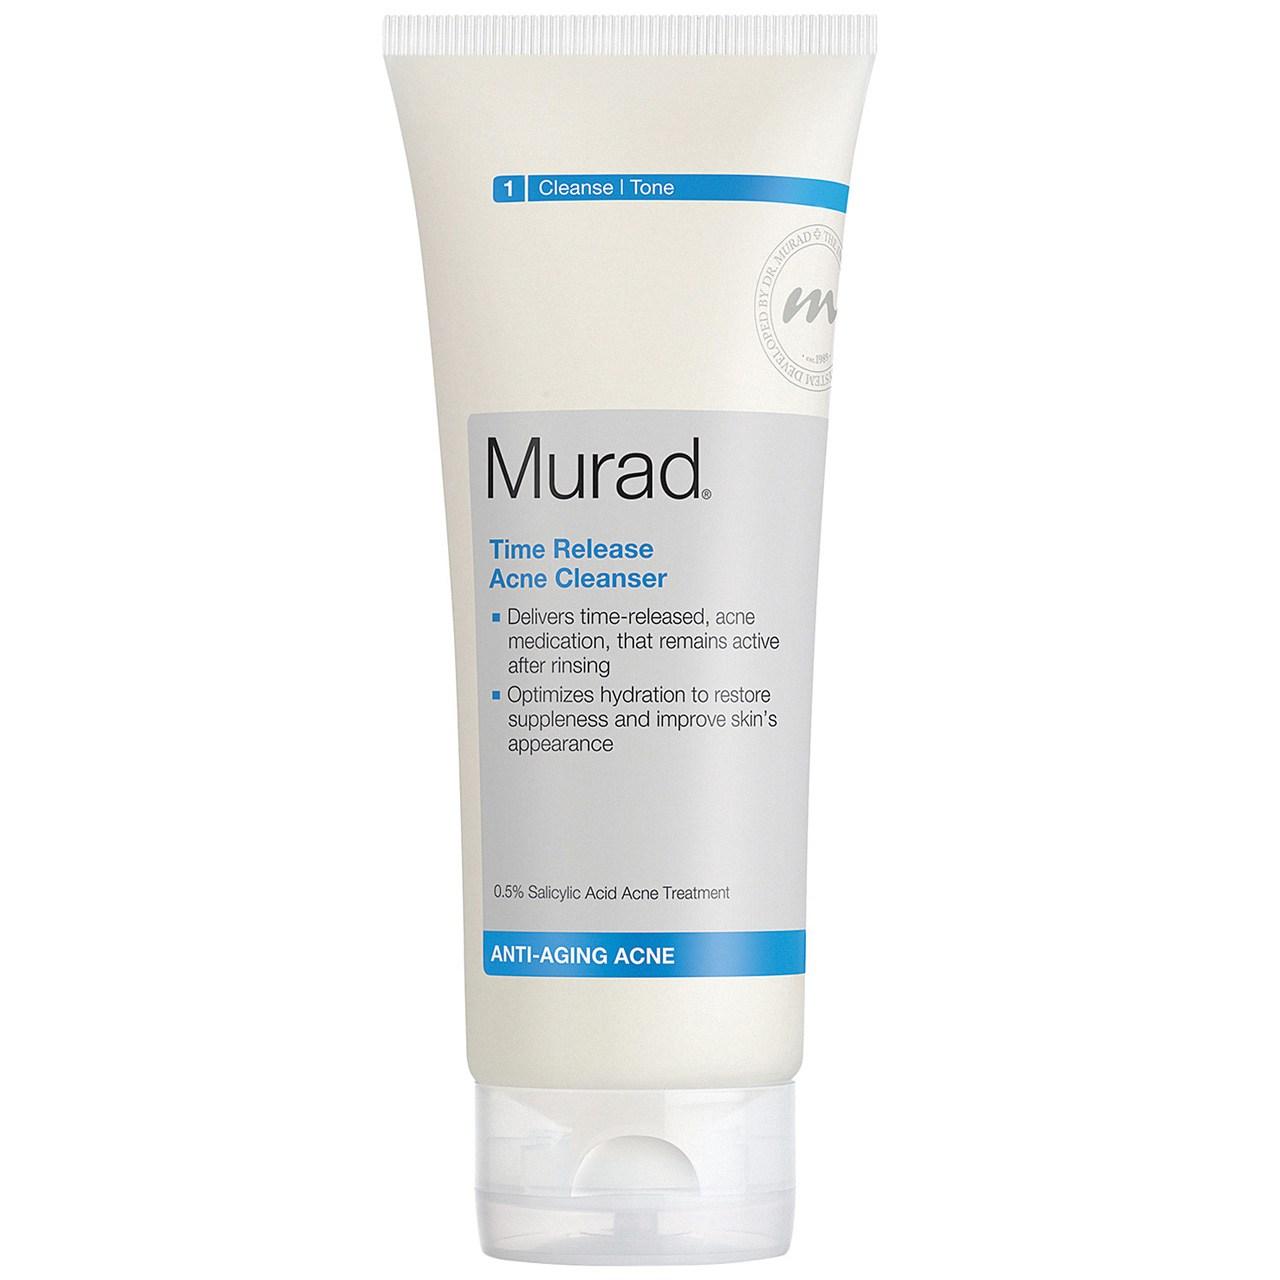 کرم پاک کننده مورد سری Anti Aging Acne Control  مدل Time Release Acne Cleanser حجم 200 میلی لیتر